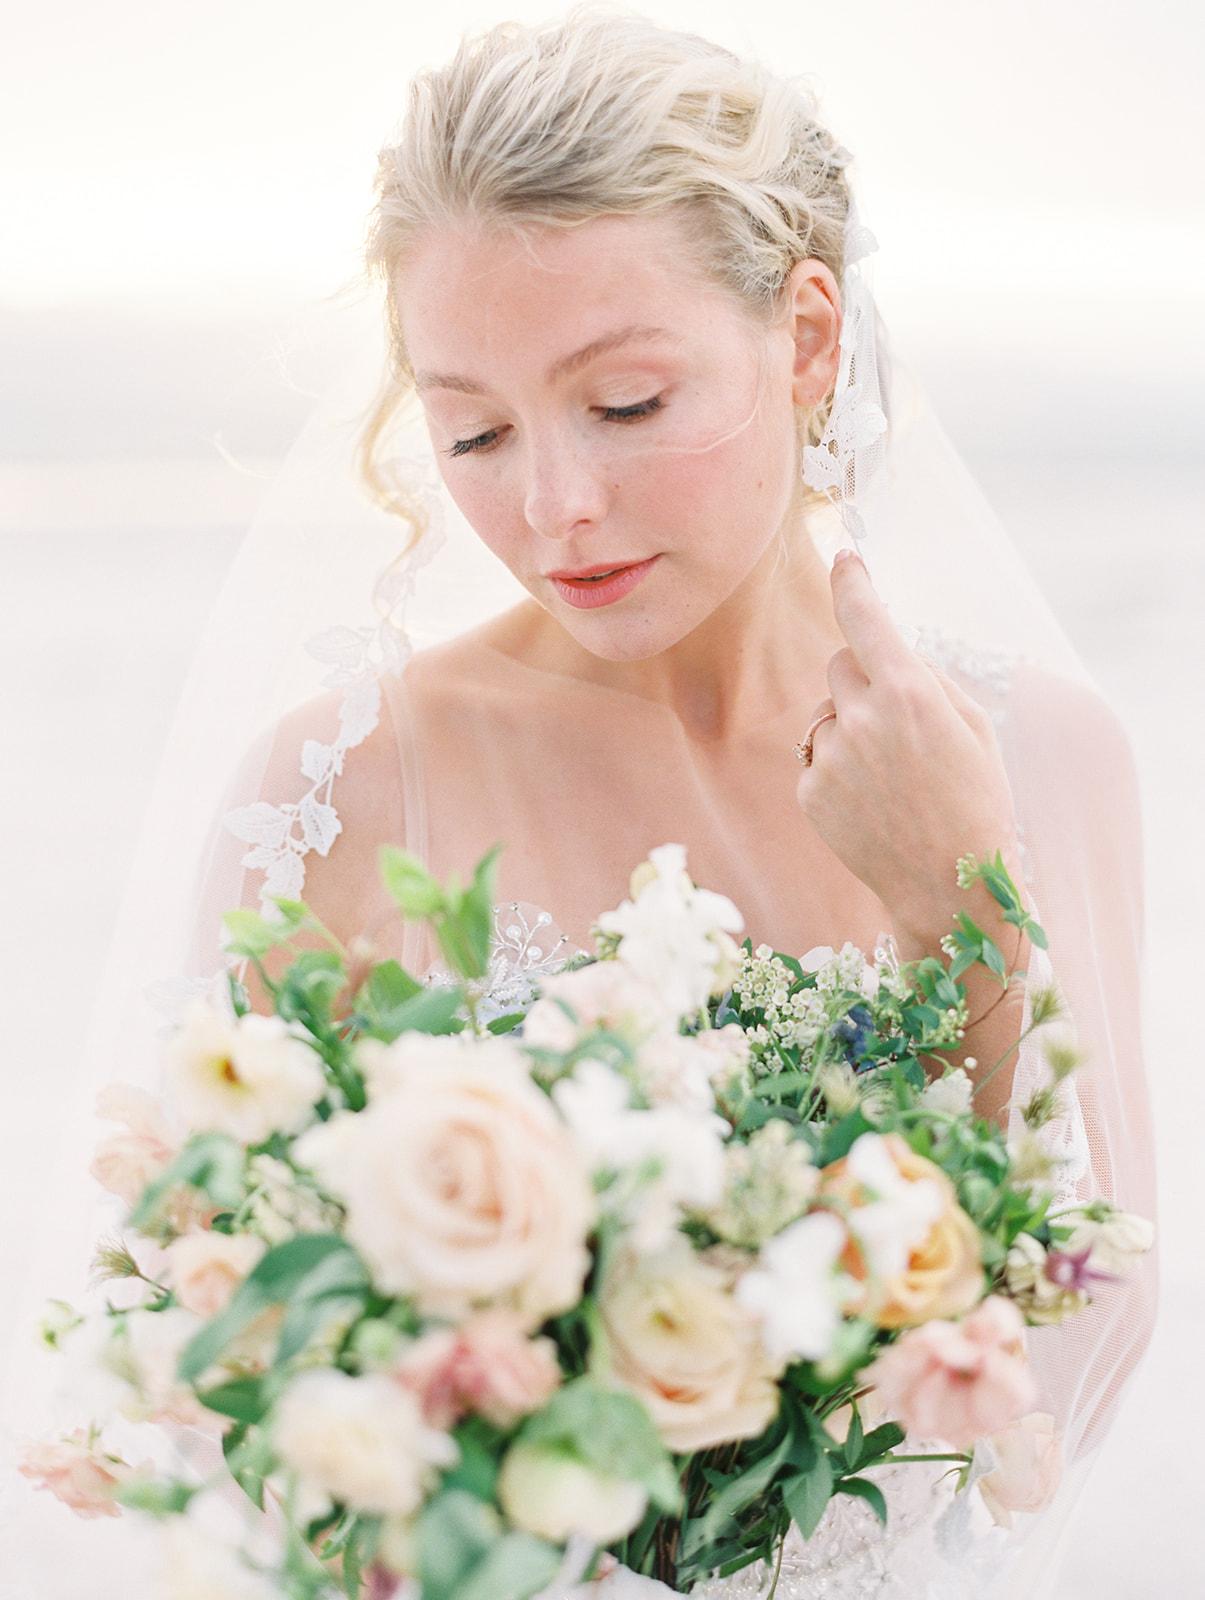 Soft, romantic wedding florals